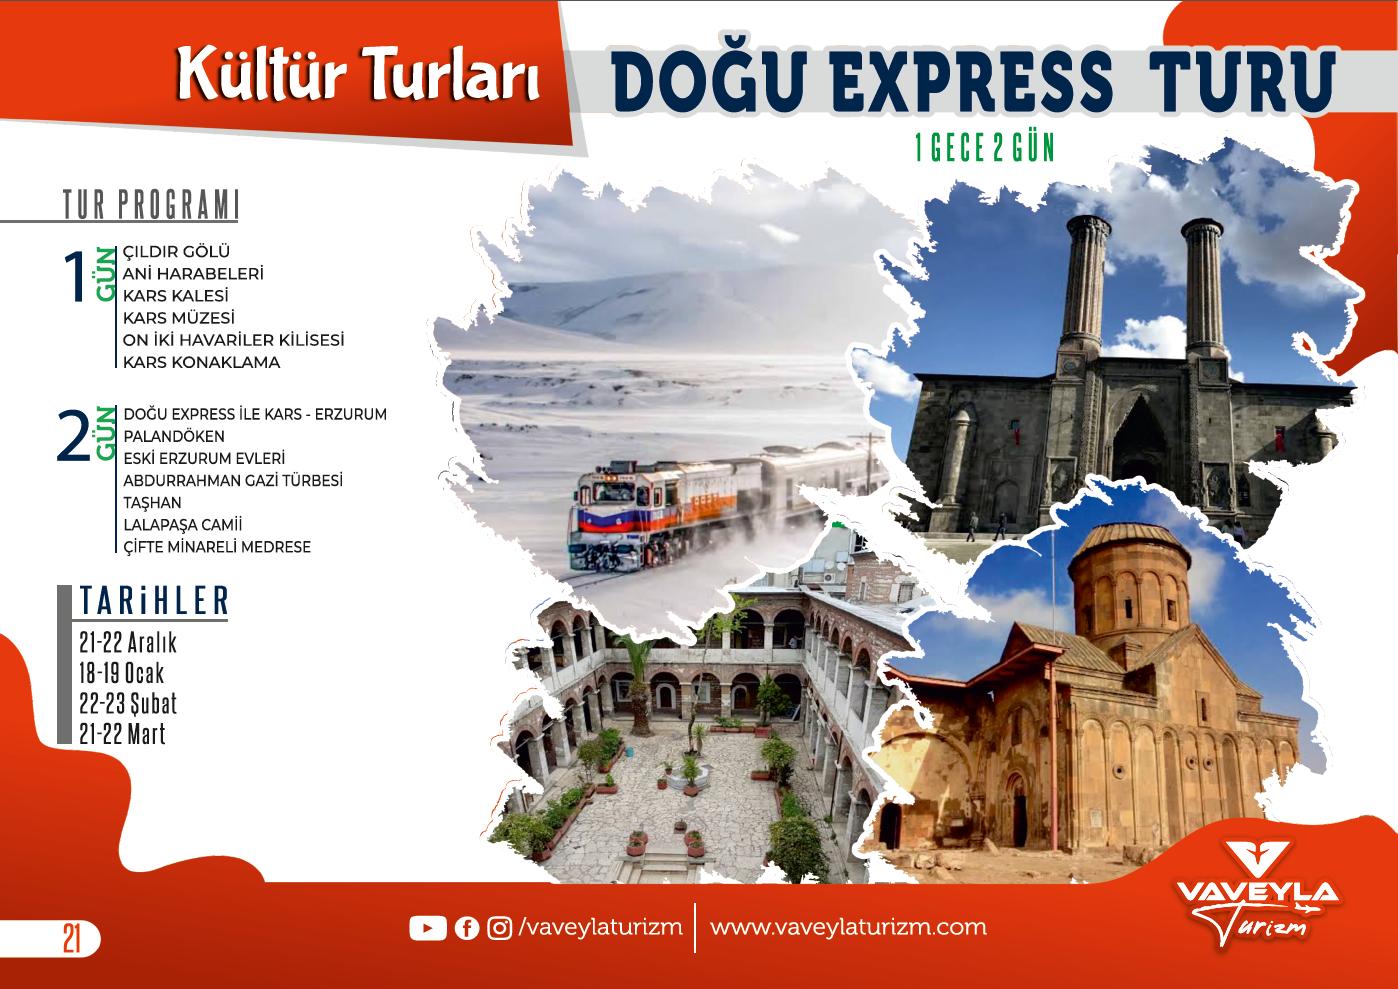 Doğu Express Turu